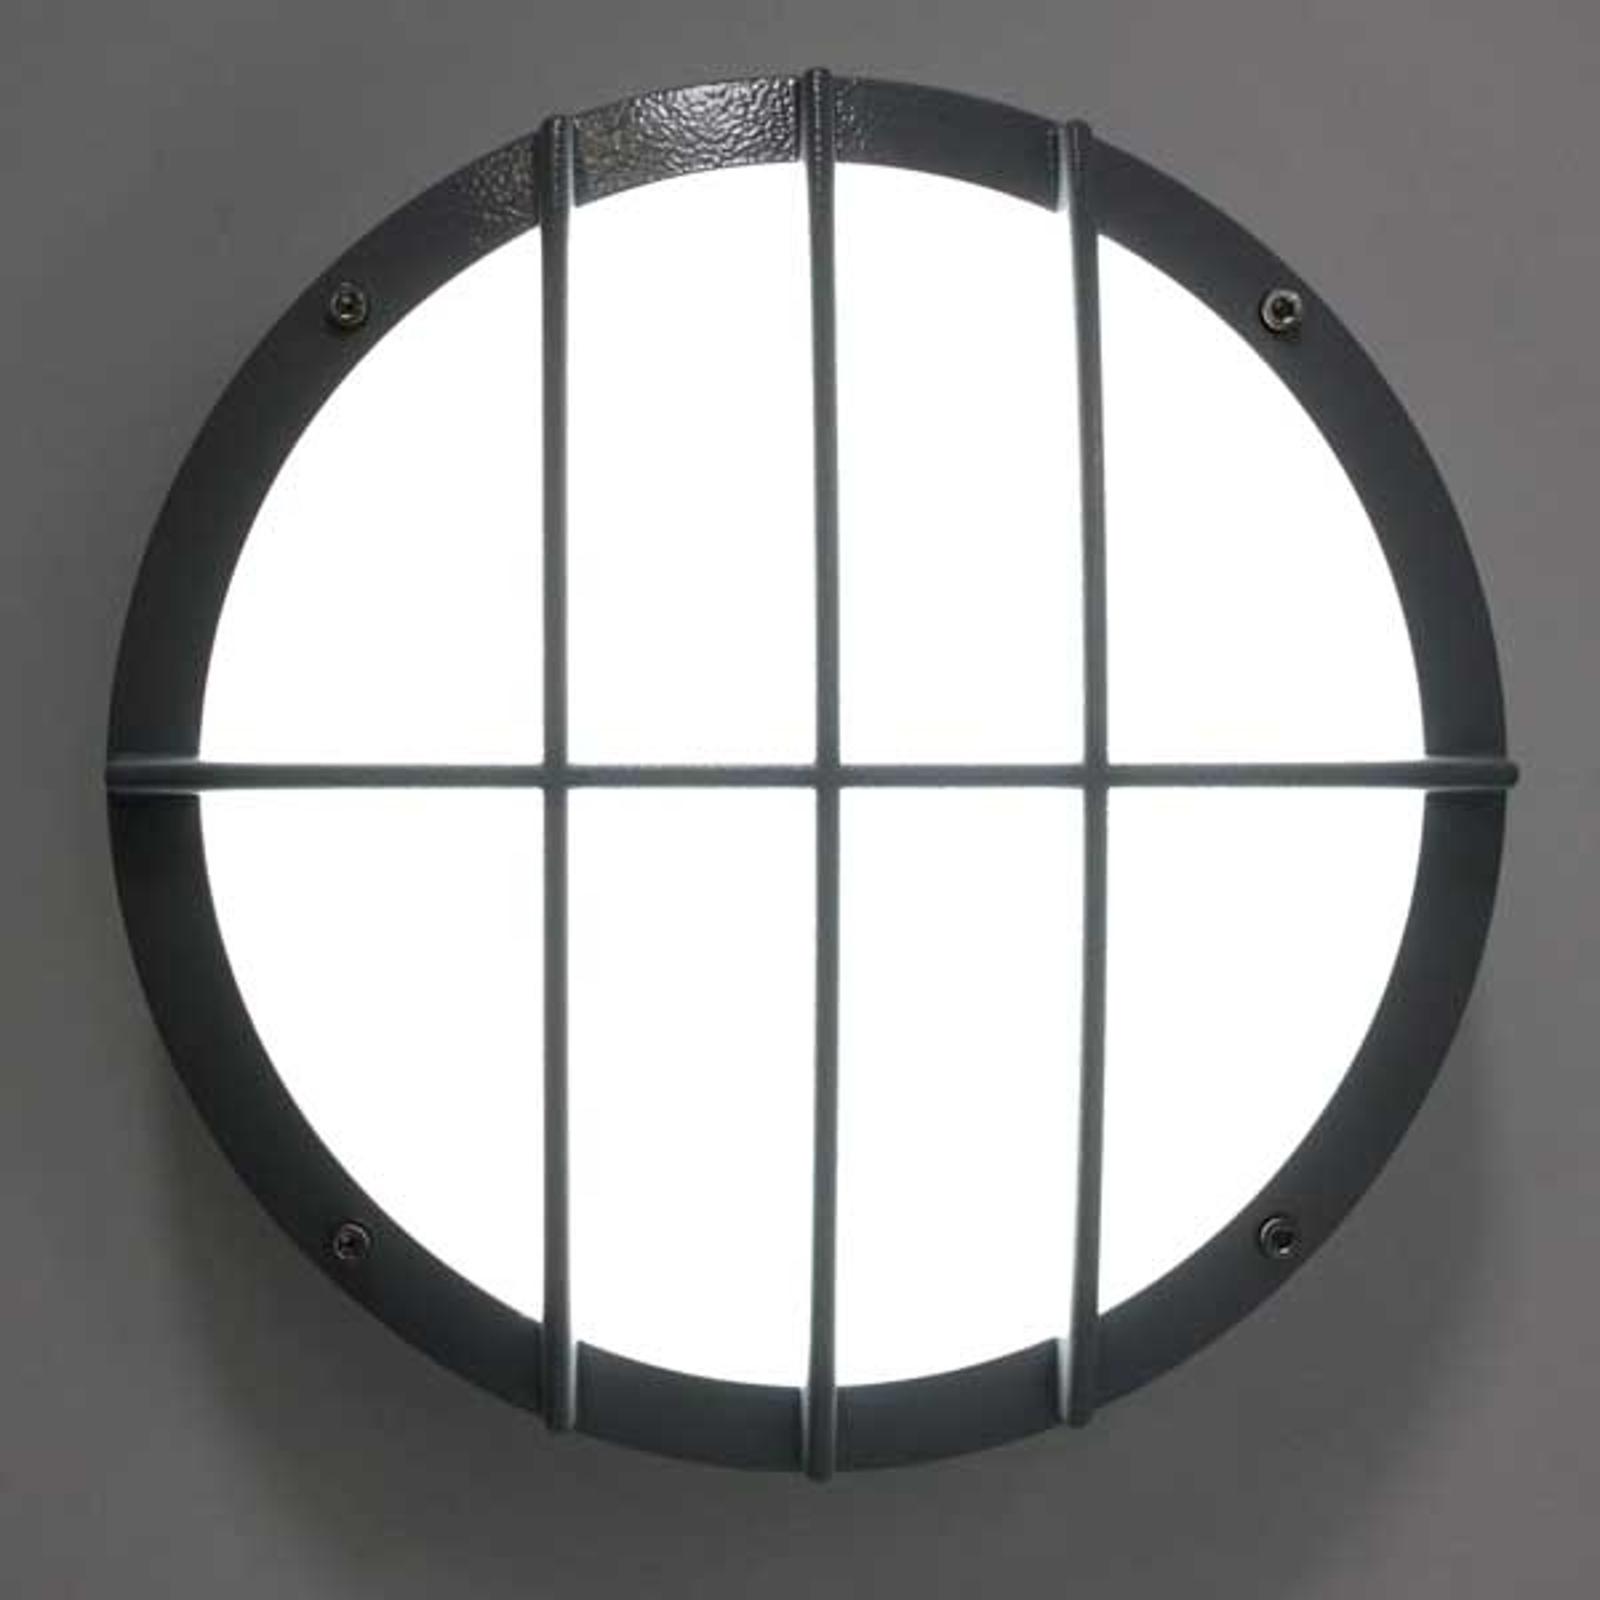 Wandlamp v aluminium spuitgietwerk SUN 8 LED 8W 4K